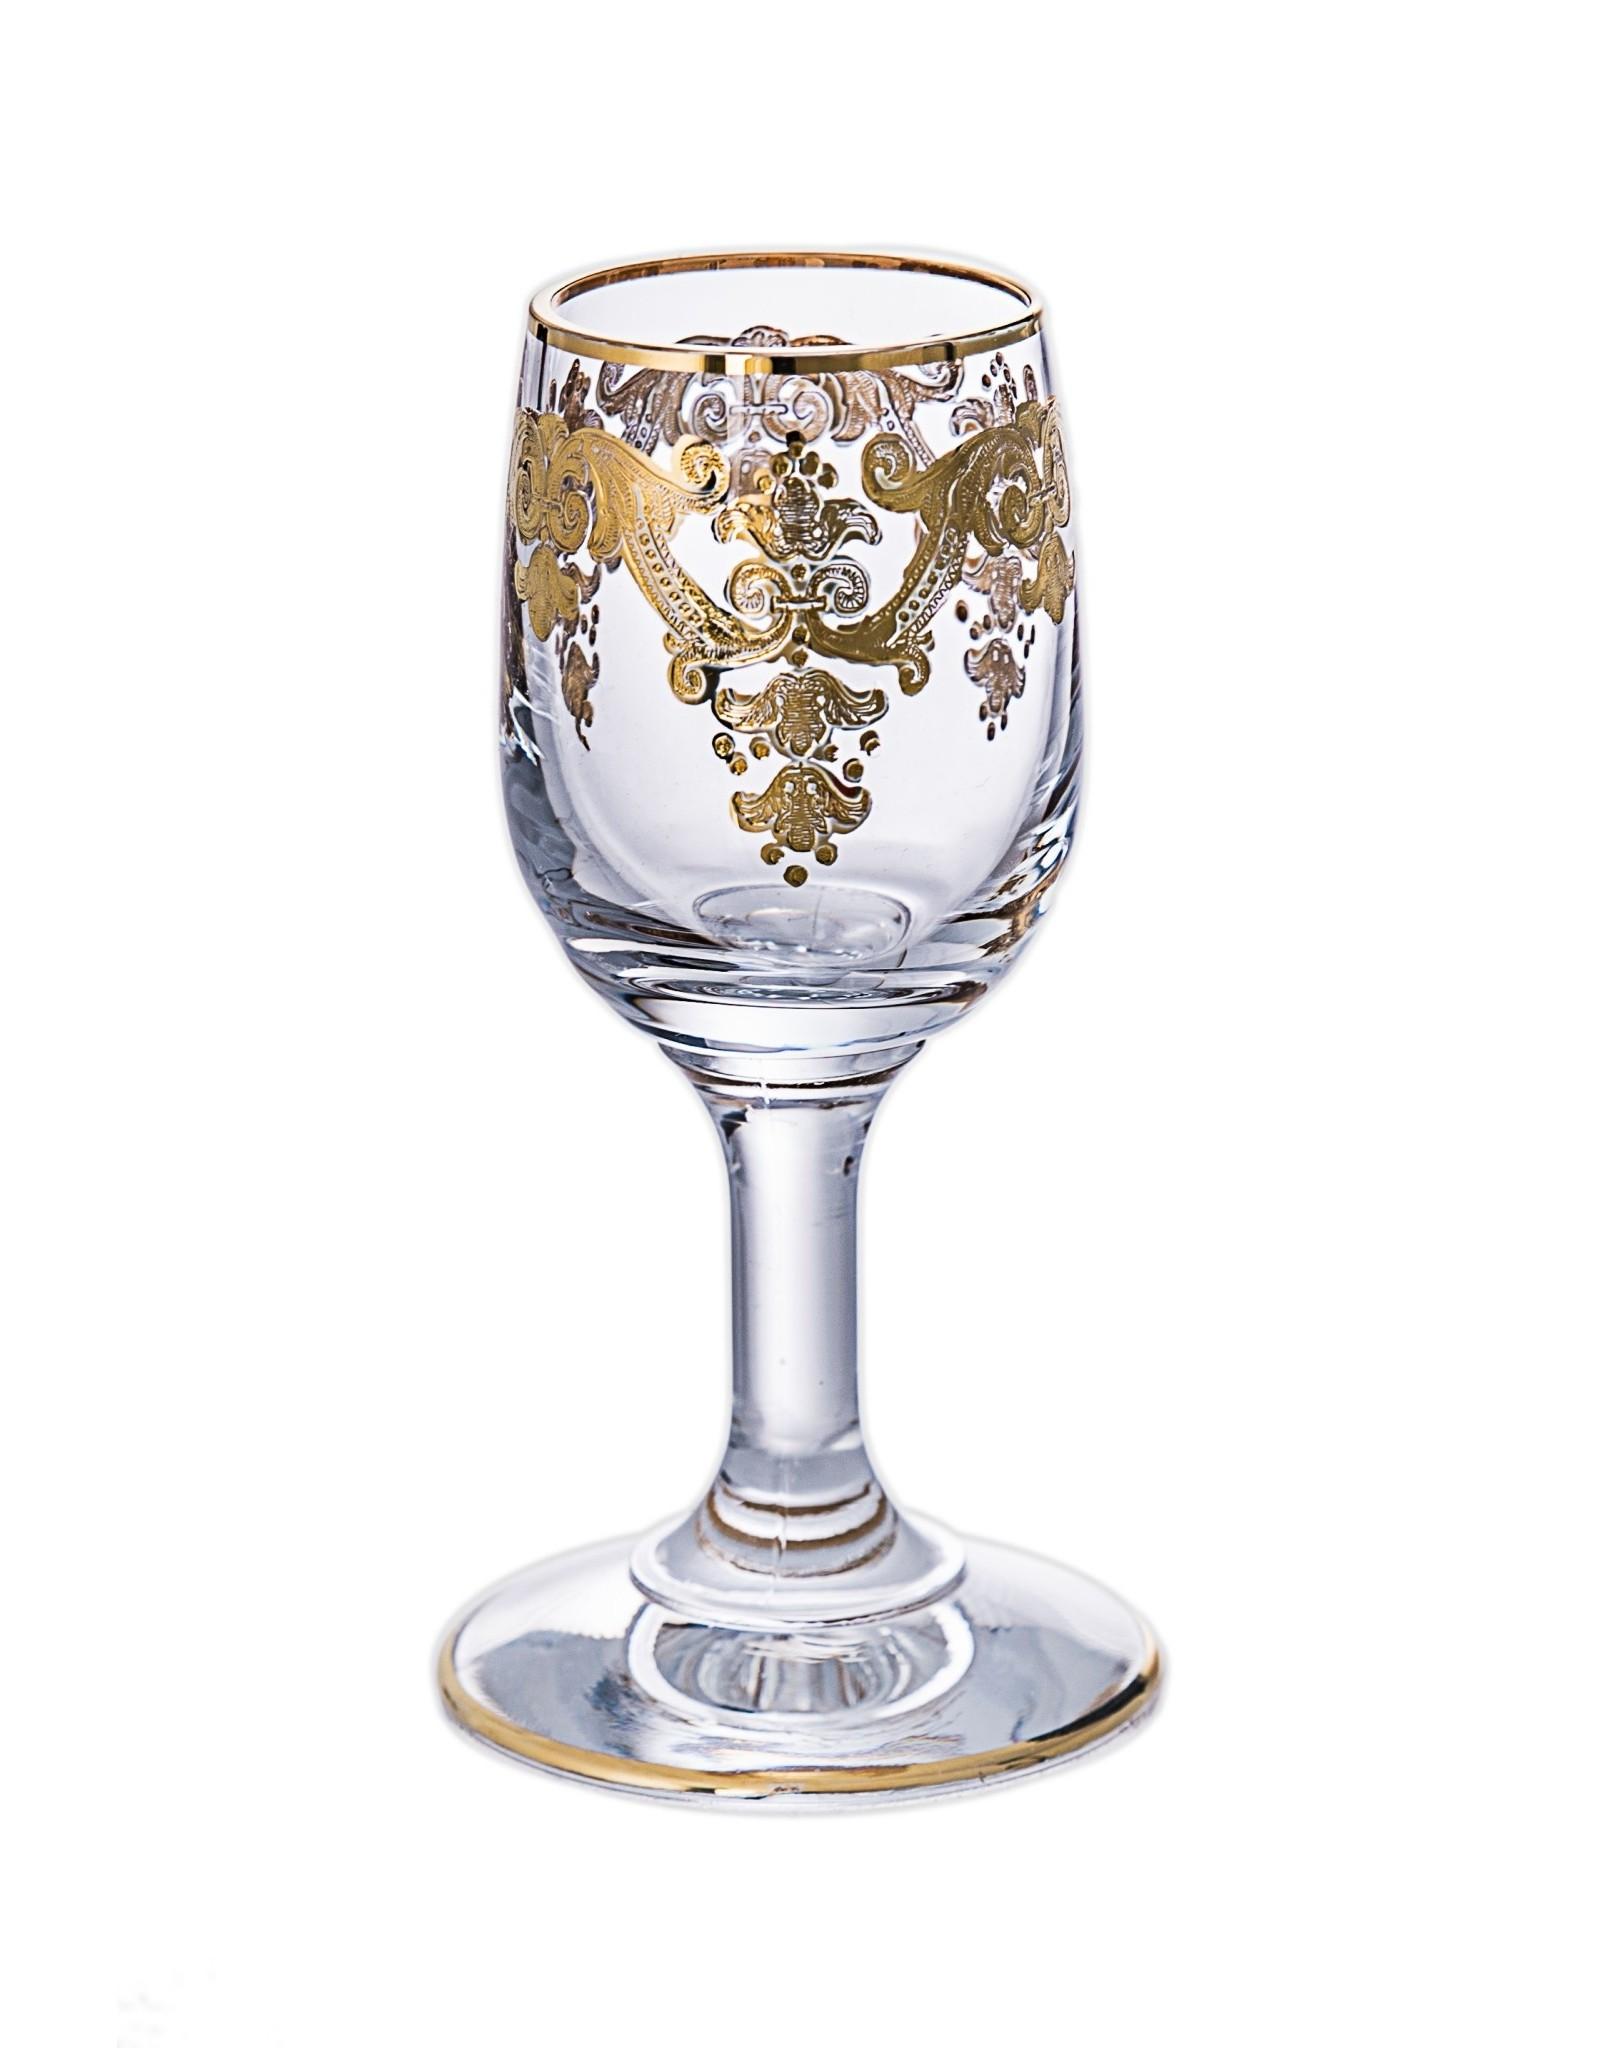 Set of 6 Vodka Glasses- 24k Gold Artwork